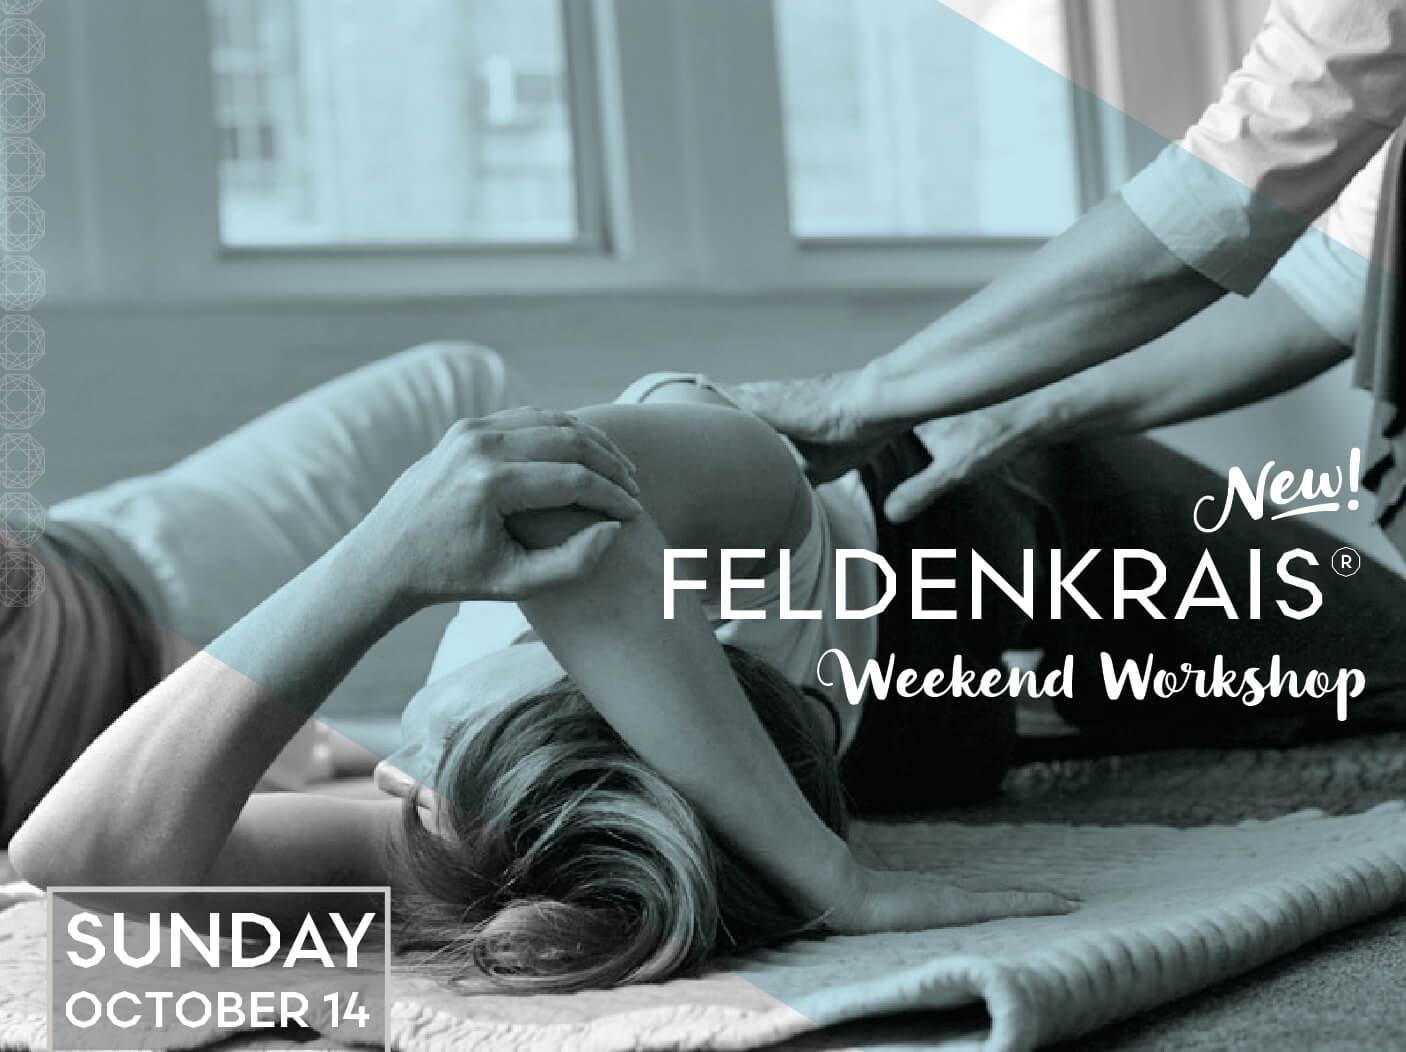 Feldenkrais®: Weekend Workshop